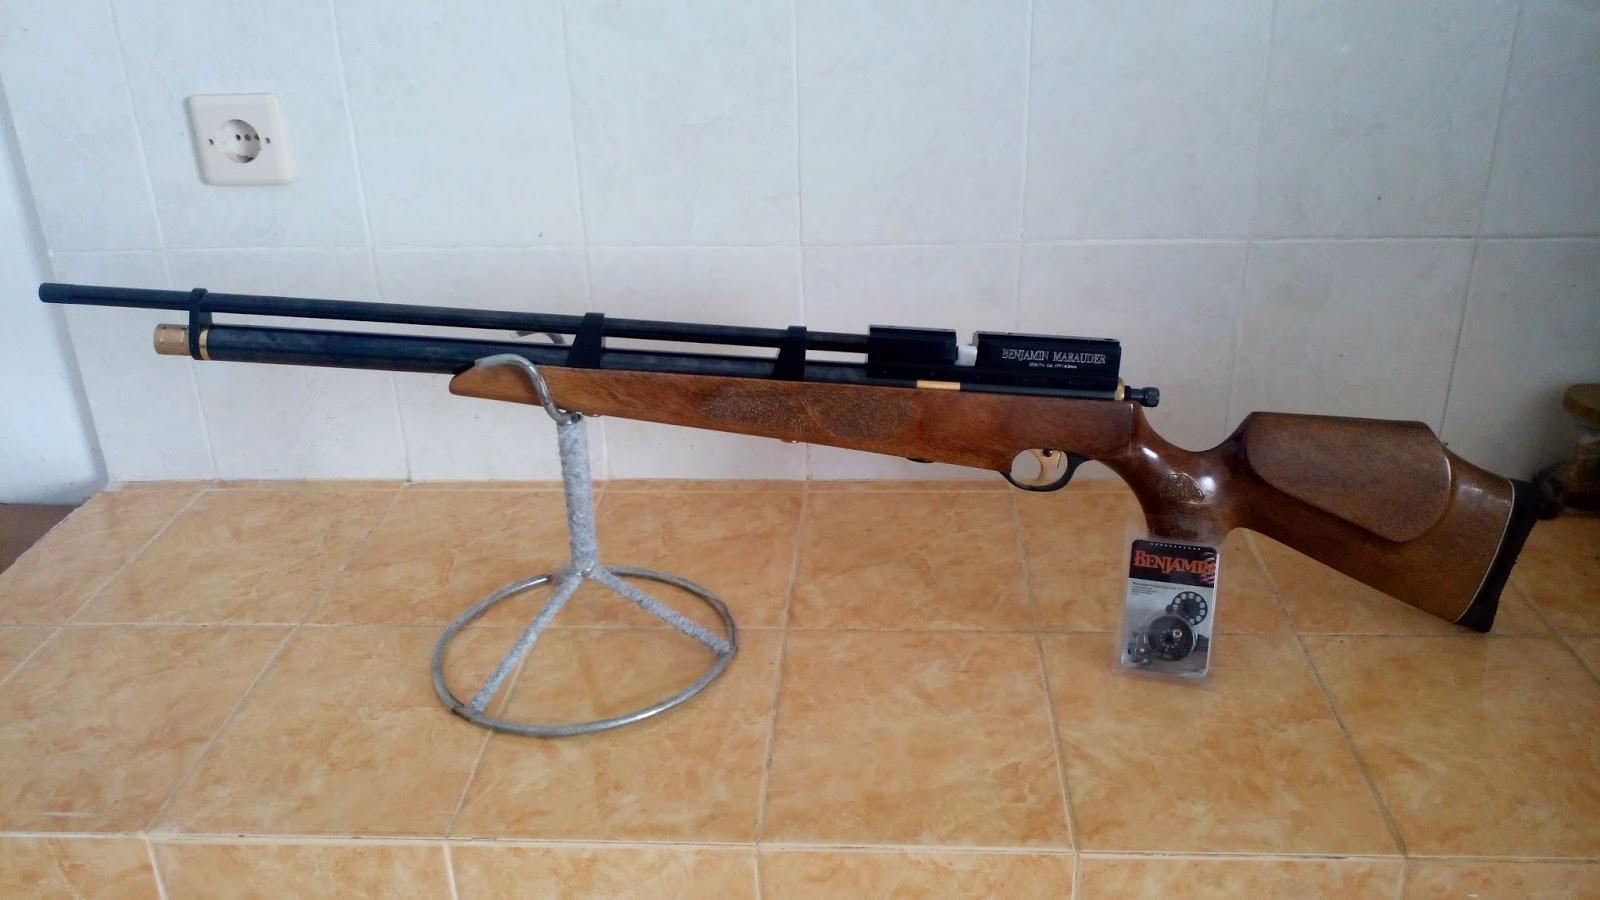 GUNS AND HOBBIES: SENAPAN PCP MAUSER SIDELEVER